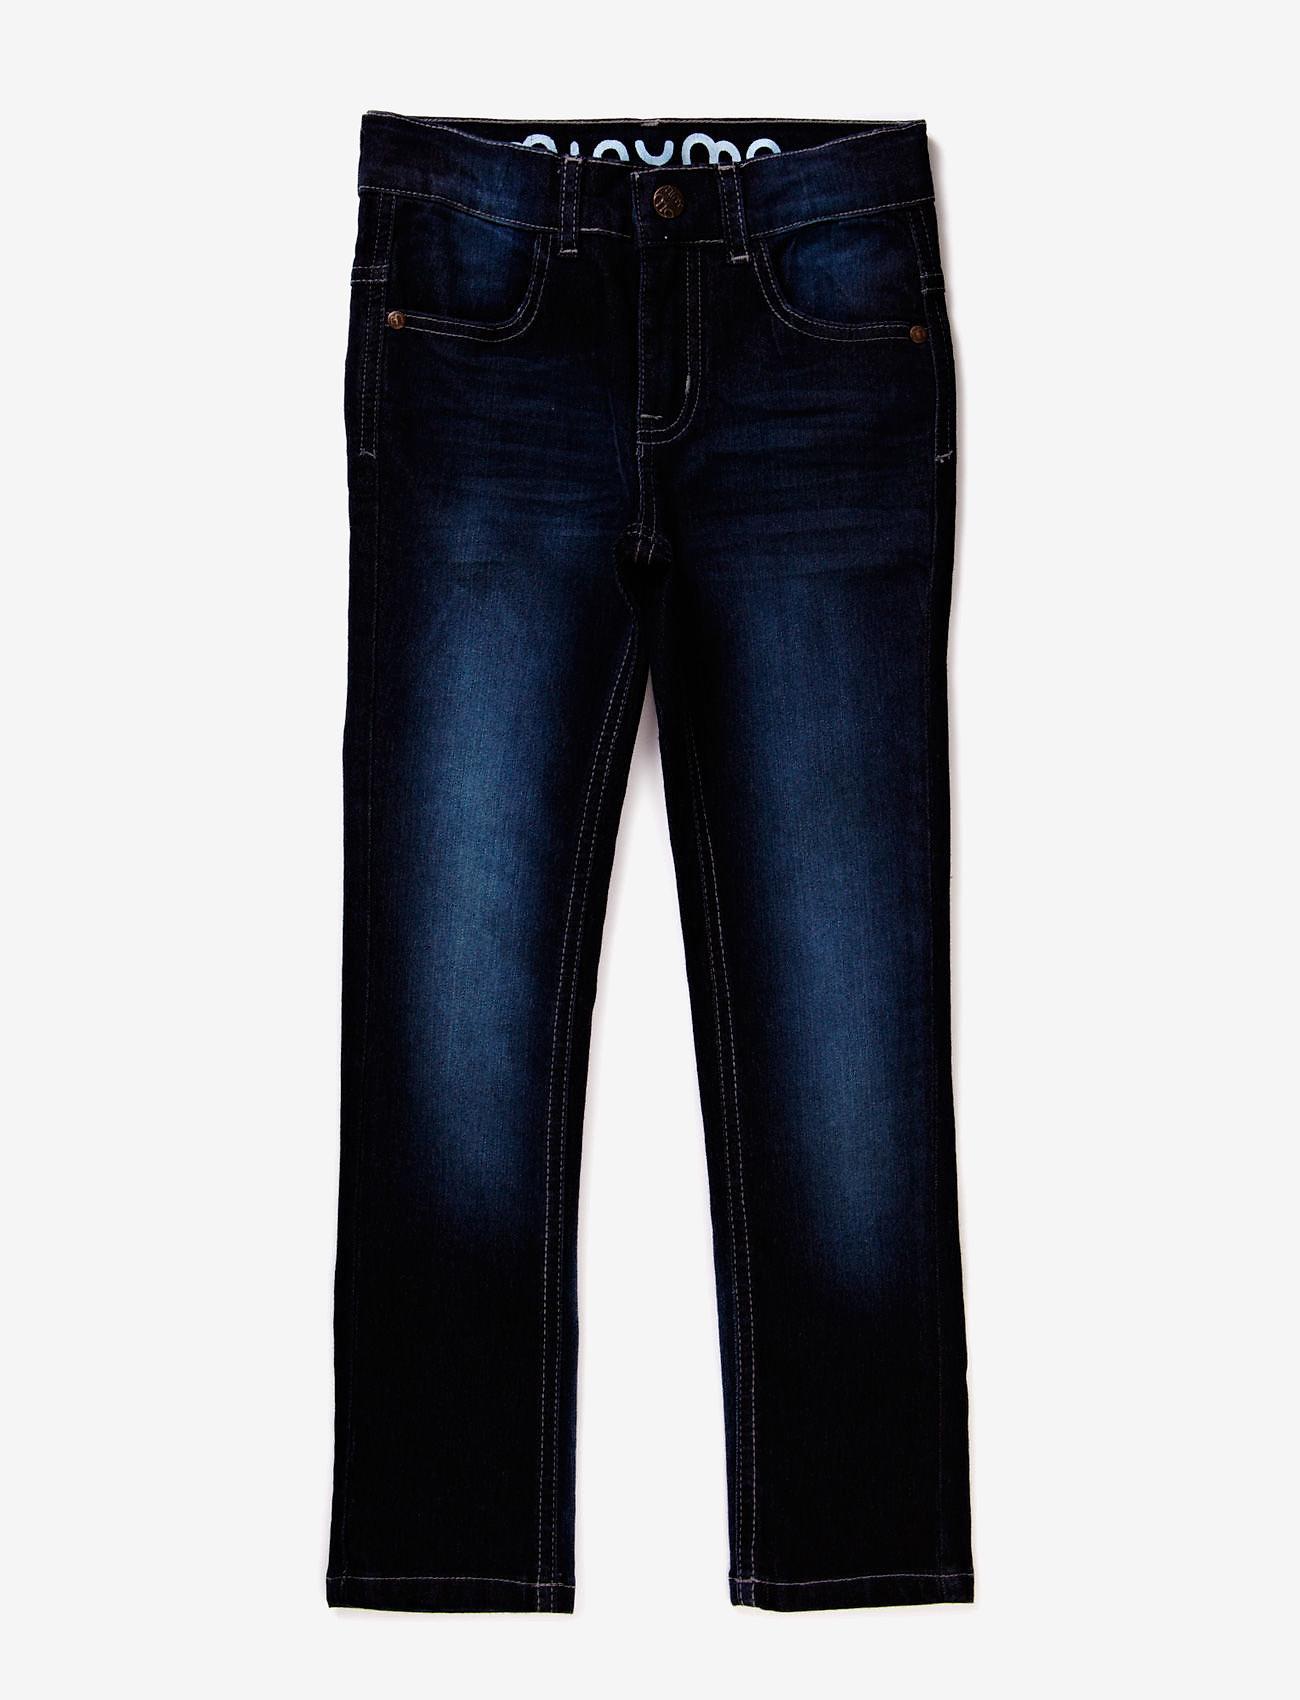 Minymo - Jeans boy Malvin - Slim fit - jeans - dark blue denim - 0